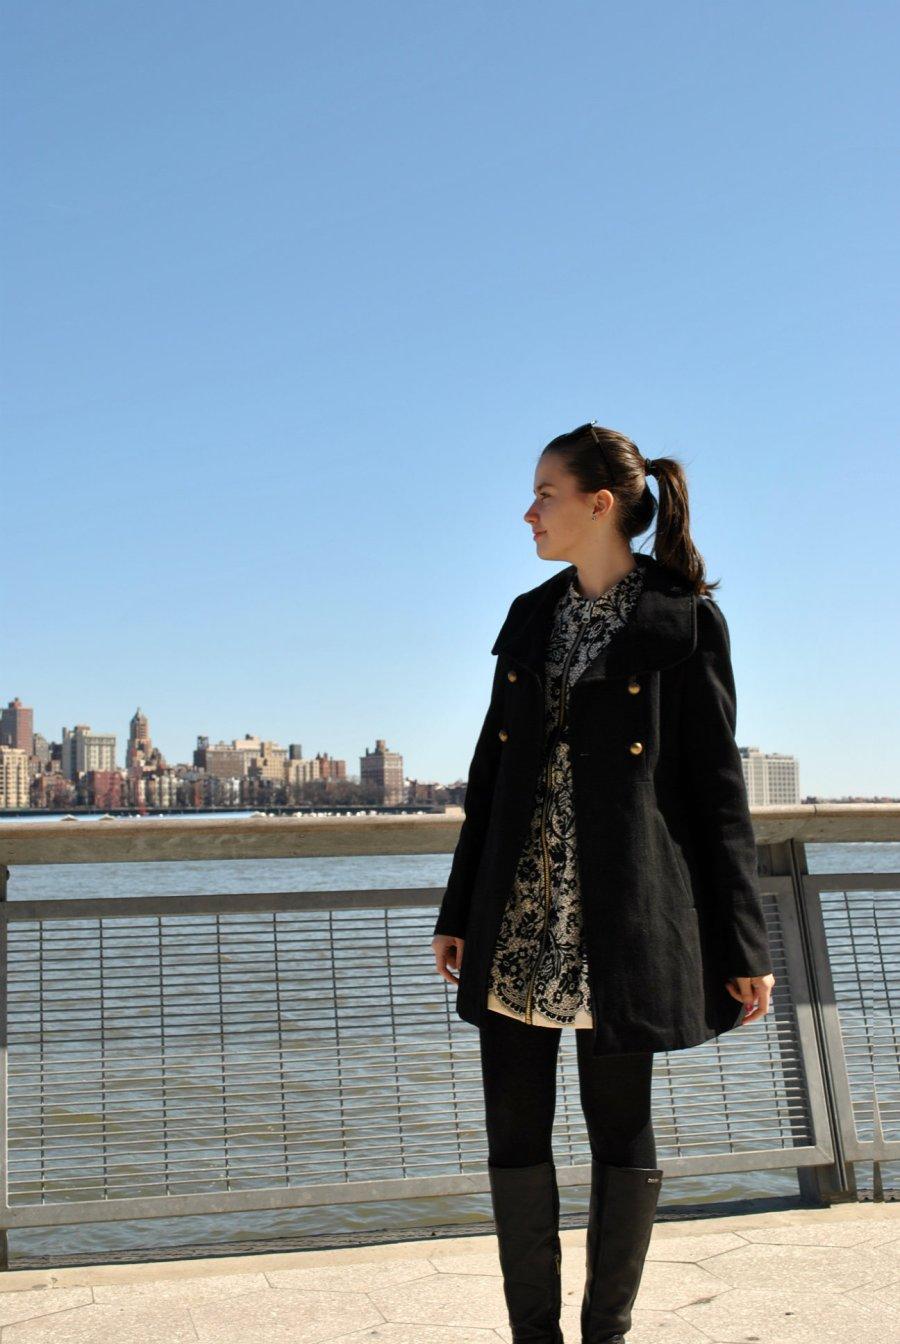 Coat-Bethany Mota for Aeropostale Dress-Forever 21 Tights-Hues Boots-DKNY Clutch-Aldo Sunglasses-Betsey Johnson